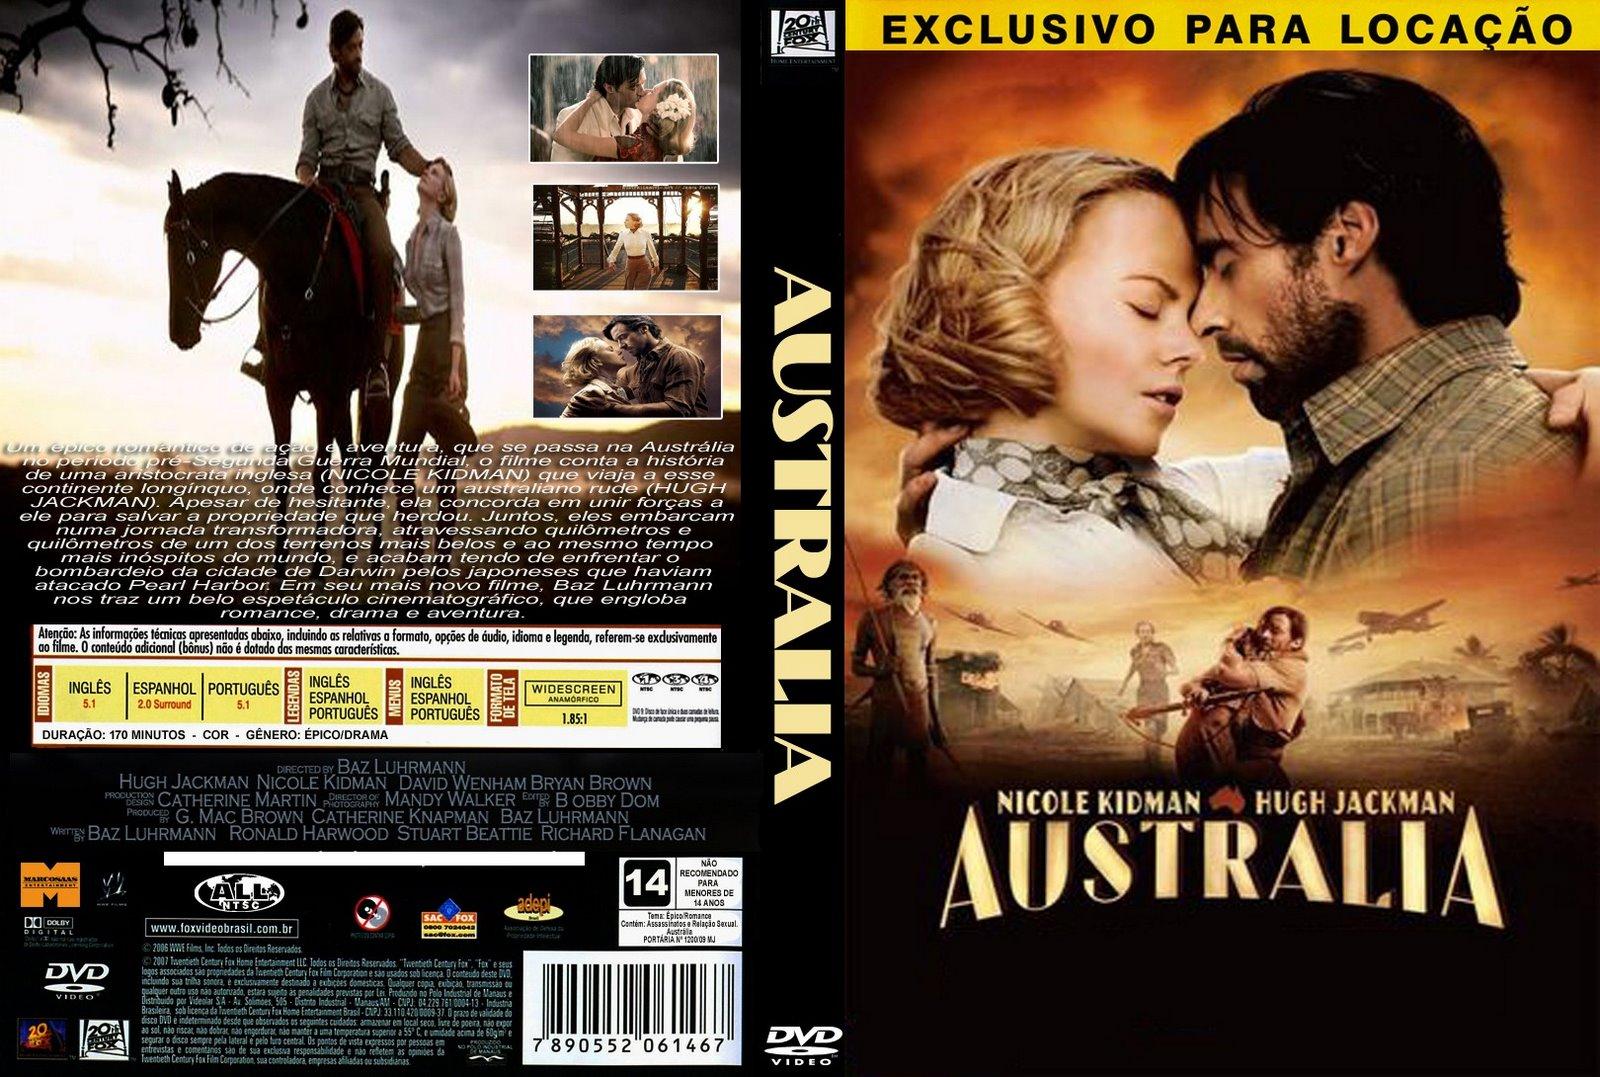 http://4.bp.blogspot.com/_eoutIDi4zcY/S9b5CuHVkYI/AAAAAAAAAwU/bQdD-P-6HnY/s1600/Australia.jpg